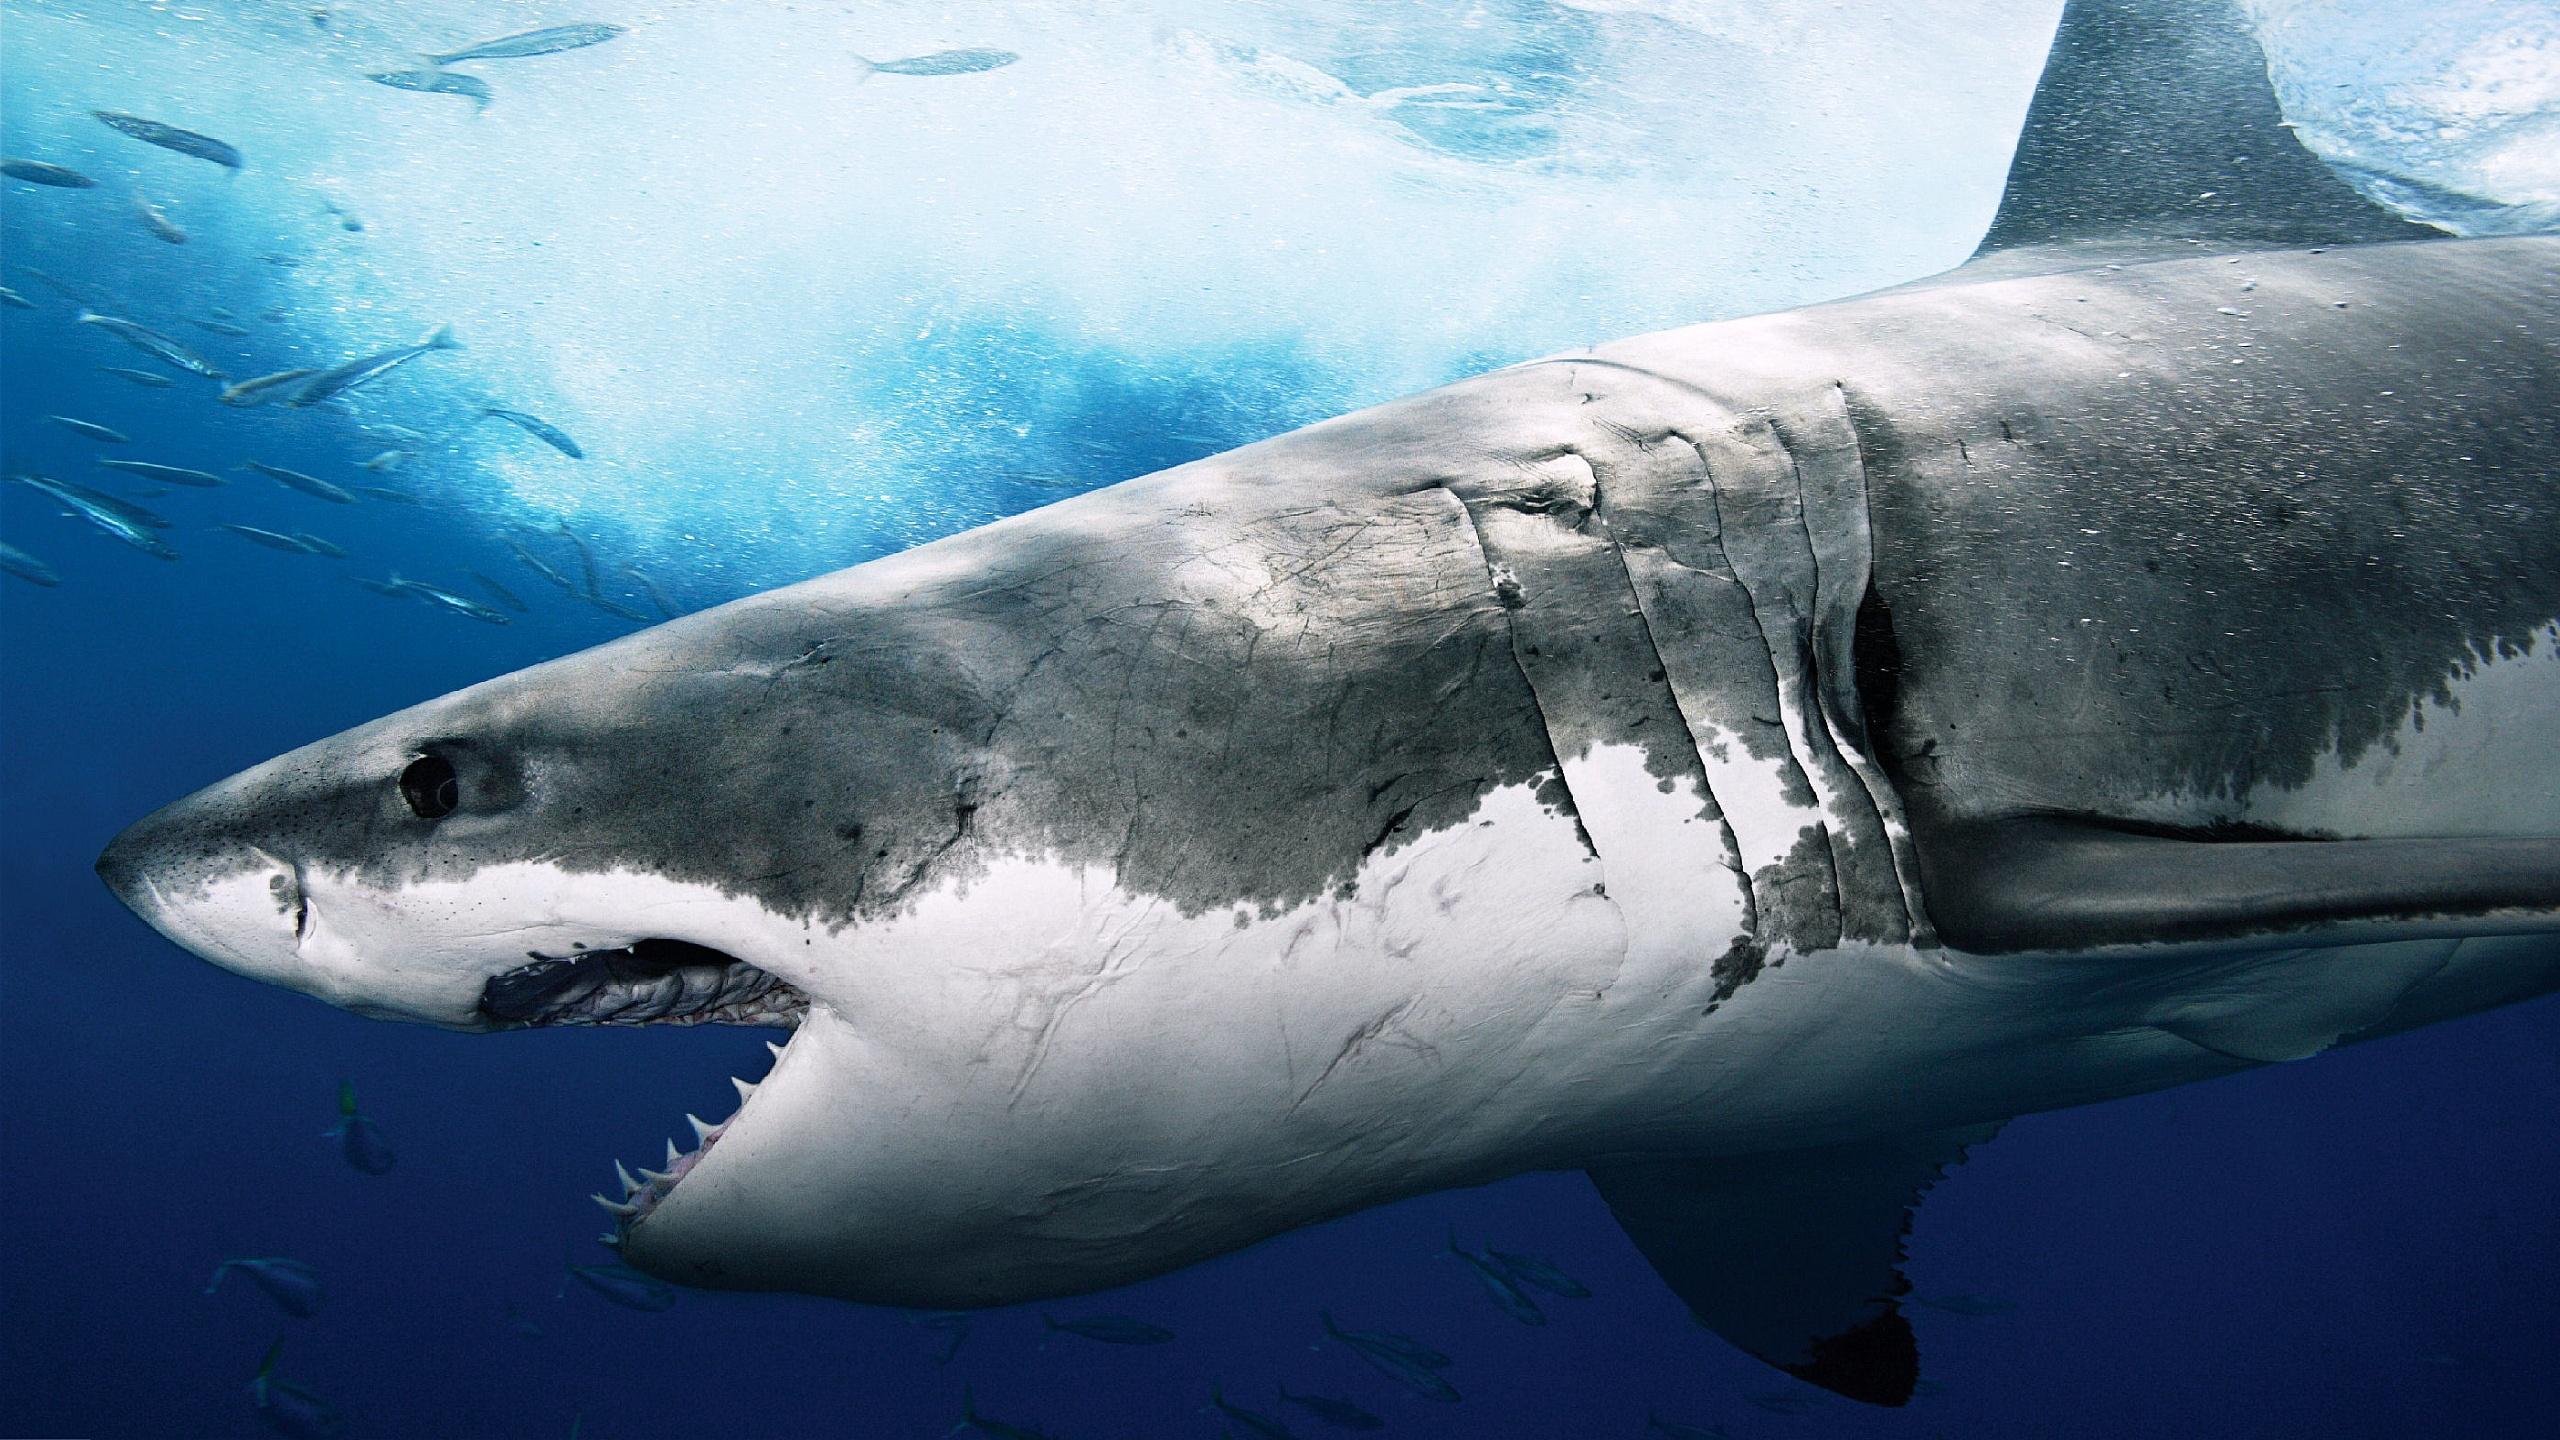 Description: The Wallpaper above is Huge shark Wallpaper in Resolution 2560x1440. Choose your Resolution and Download Huge shark Wallpaper